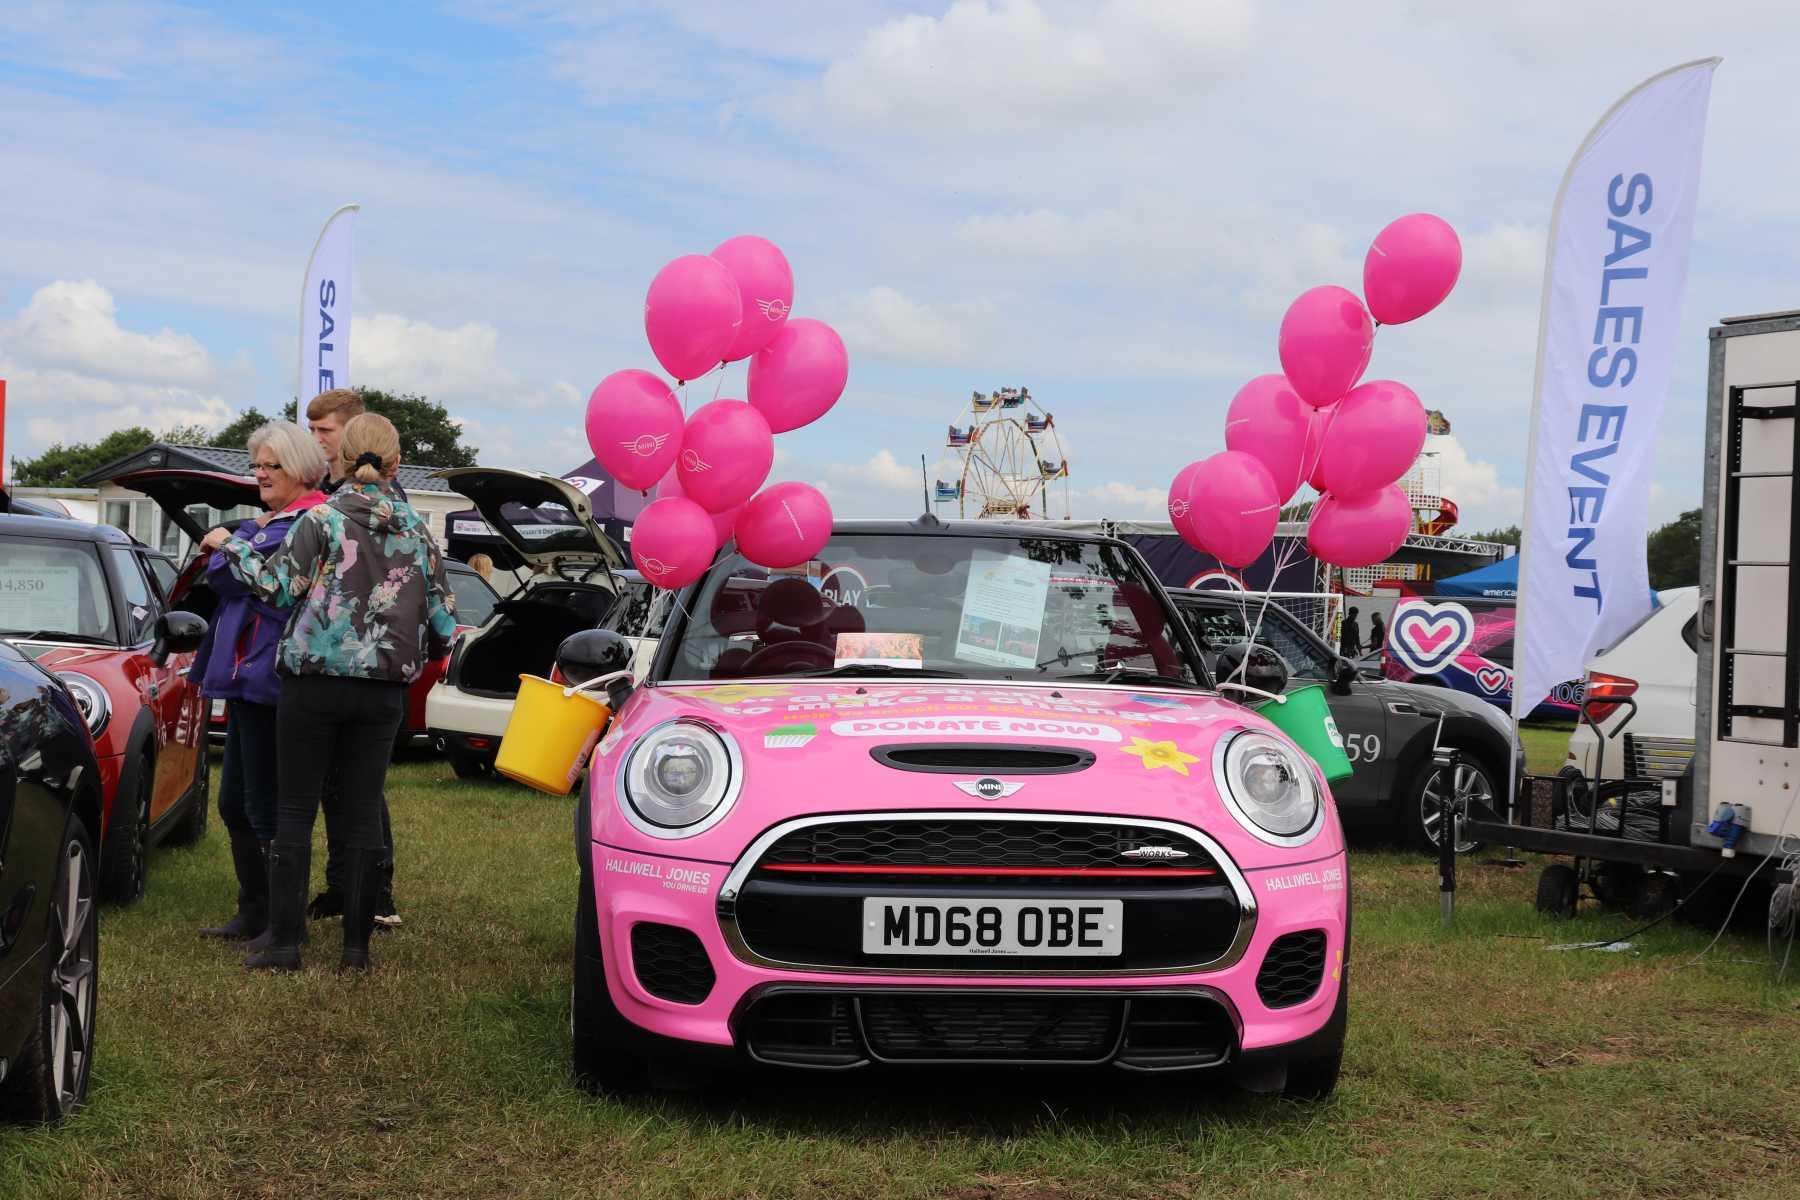 Chehsire Show 2019 pink MINI